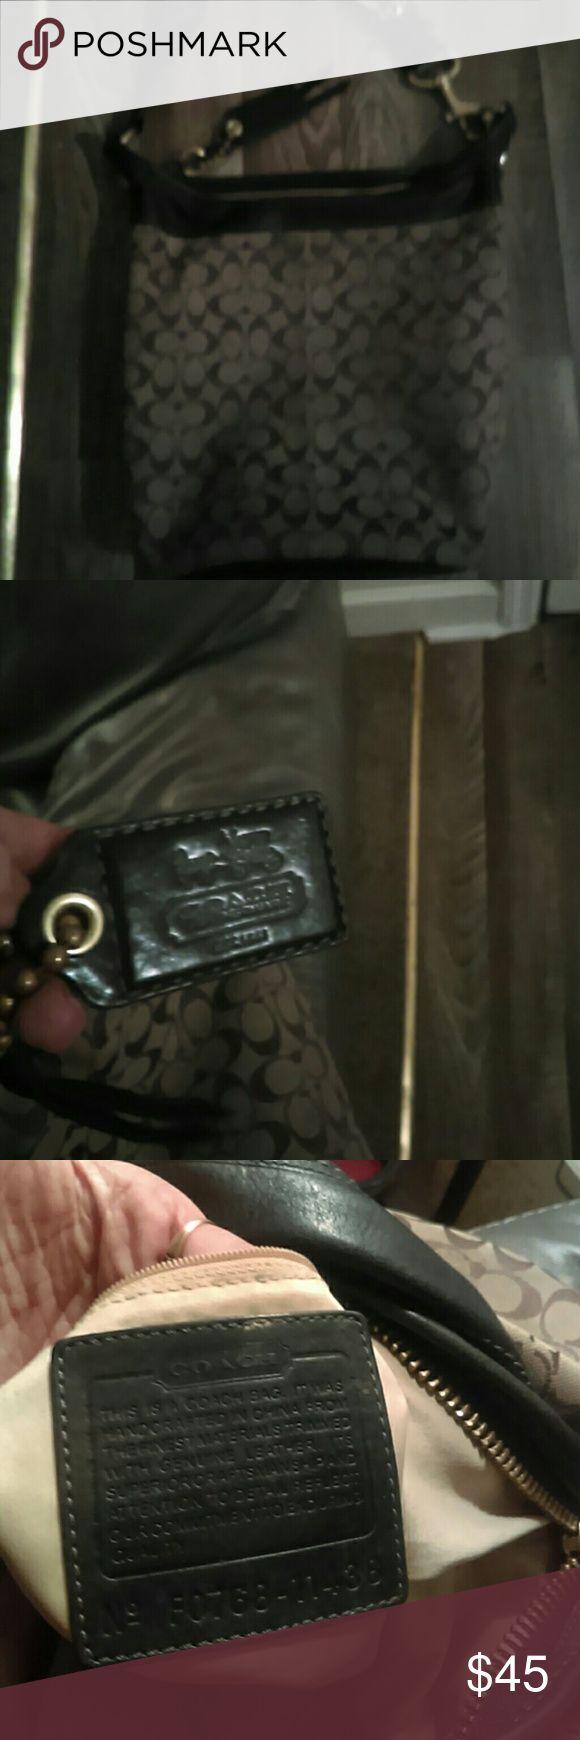 Coach pocketbook Medium size Coach purse Coach Bags Shoulder Bags